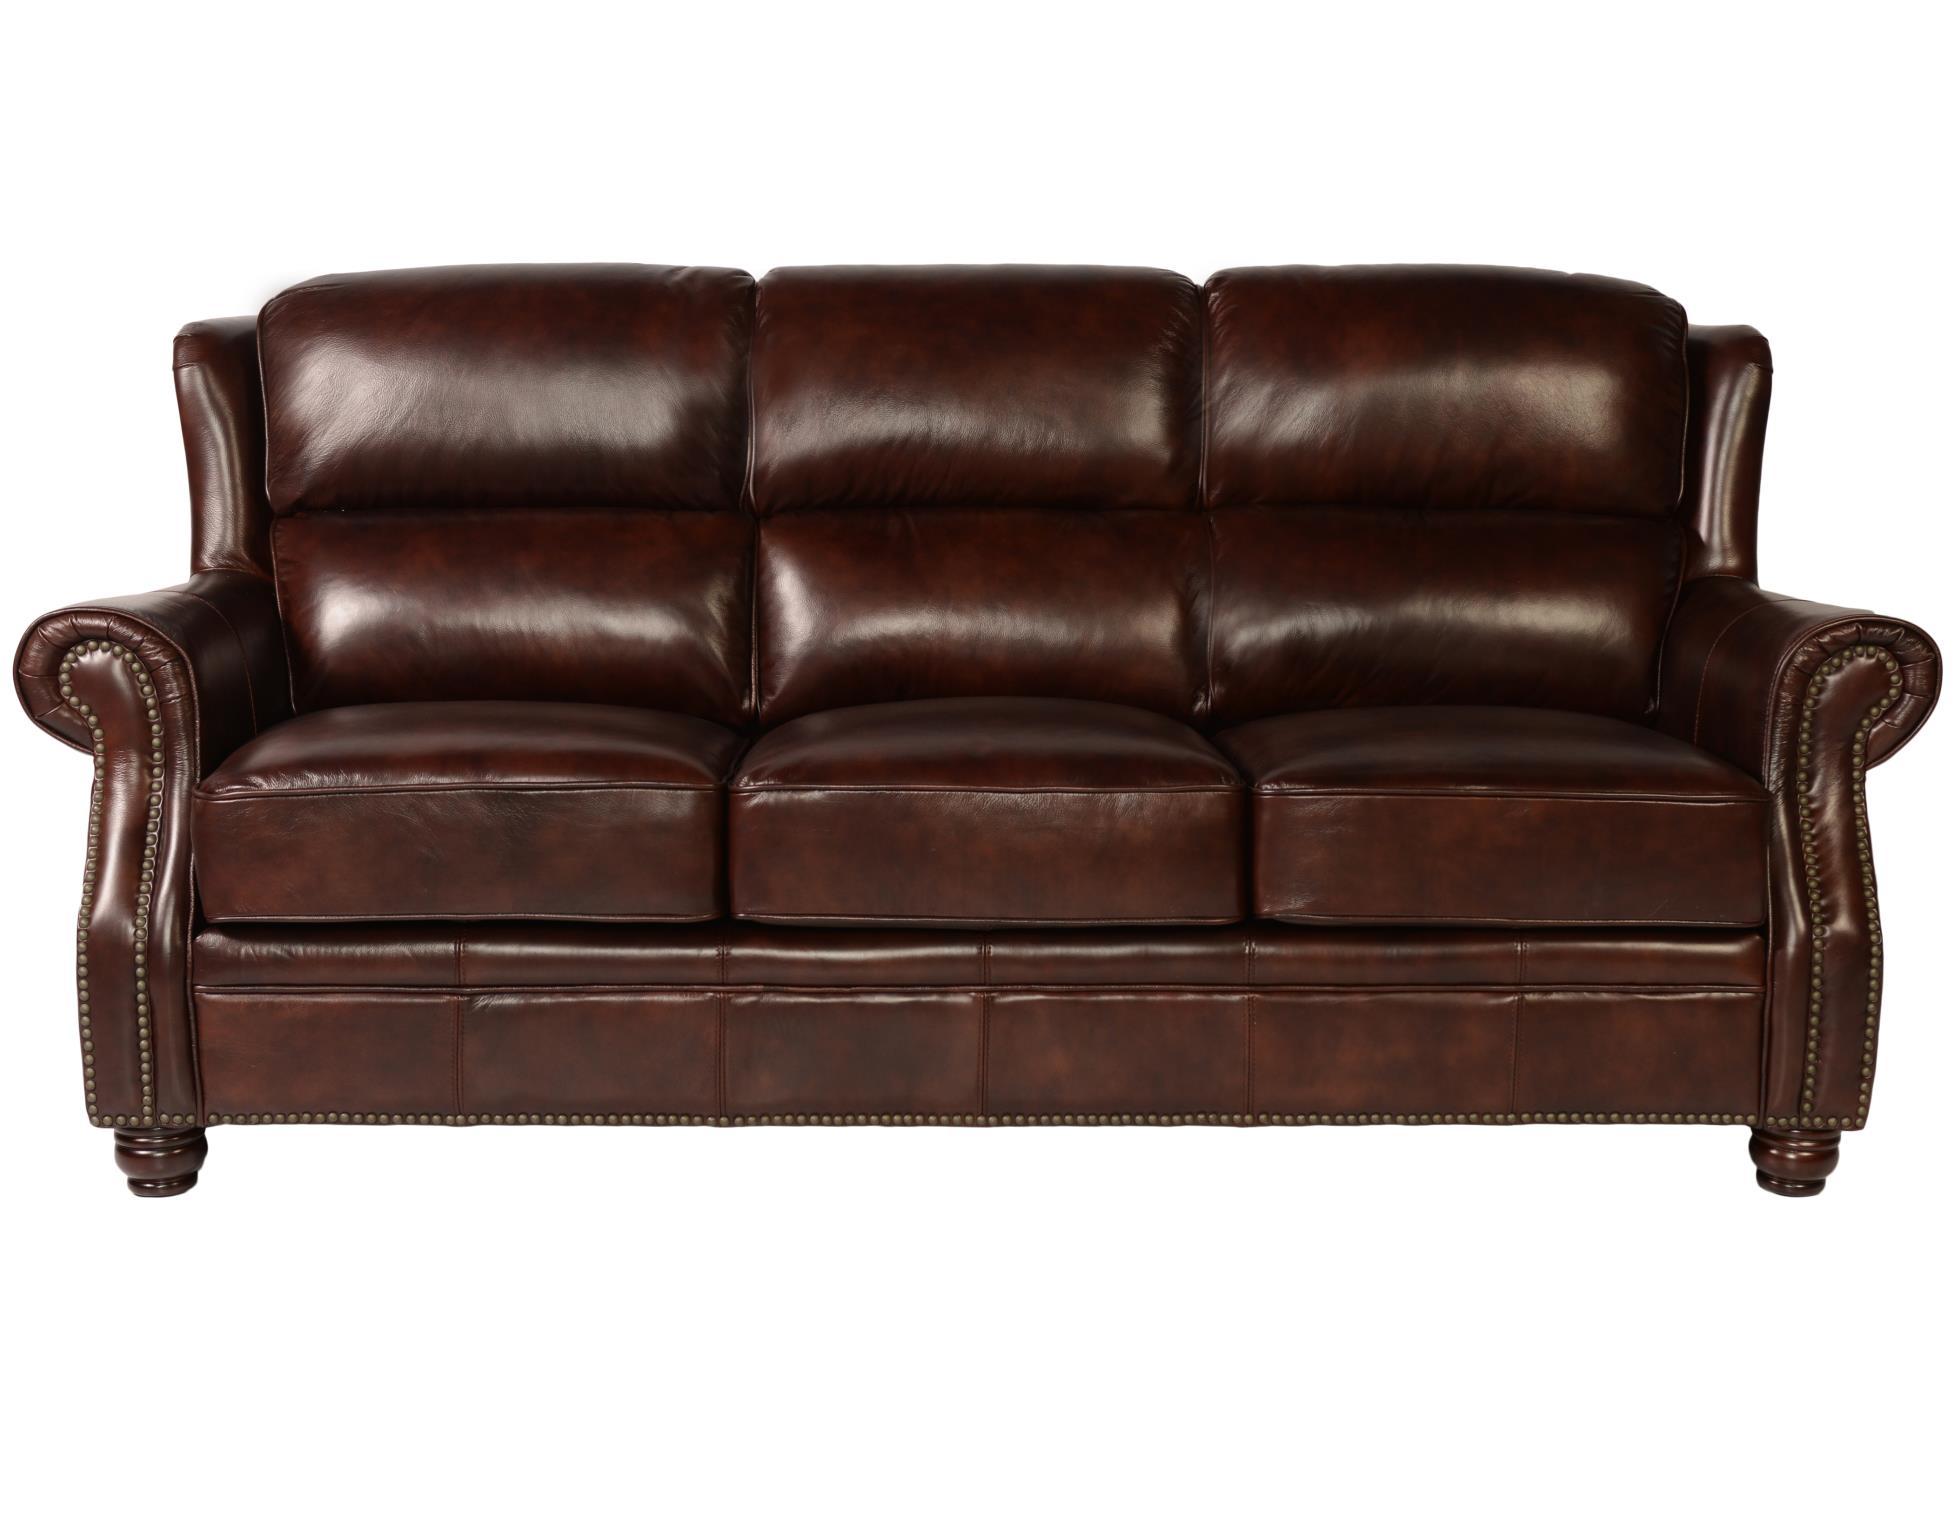 Oakwood 1418 Leather Sofa in Rustic Savauge